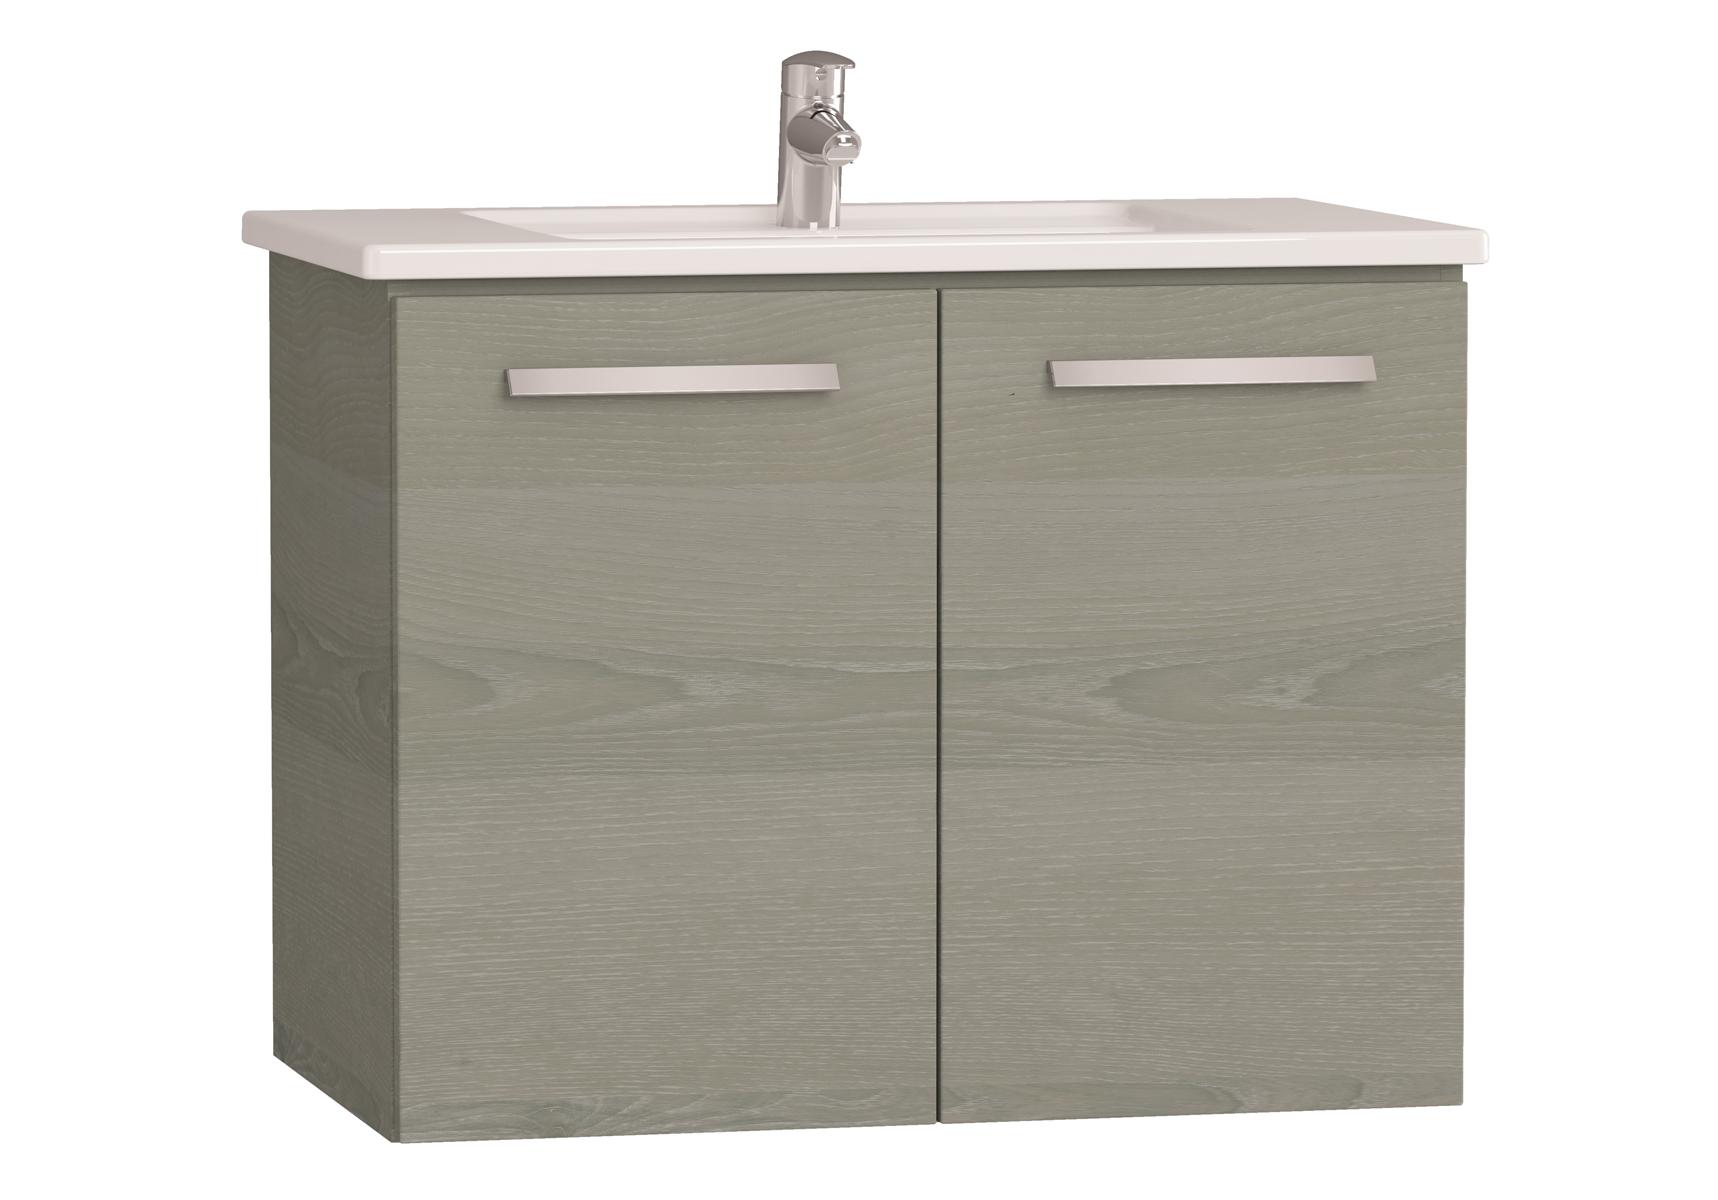 Integra meuble avec plan céramique avec portes, 80 cm, chêne gris naturel